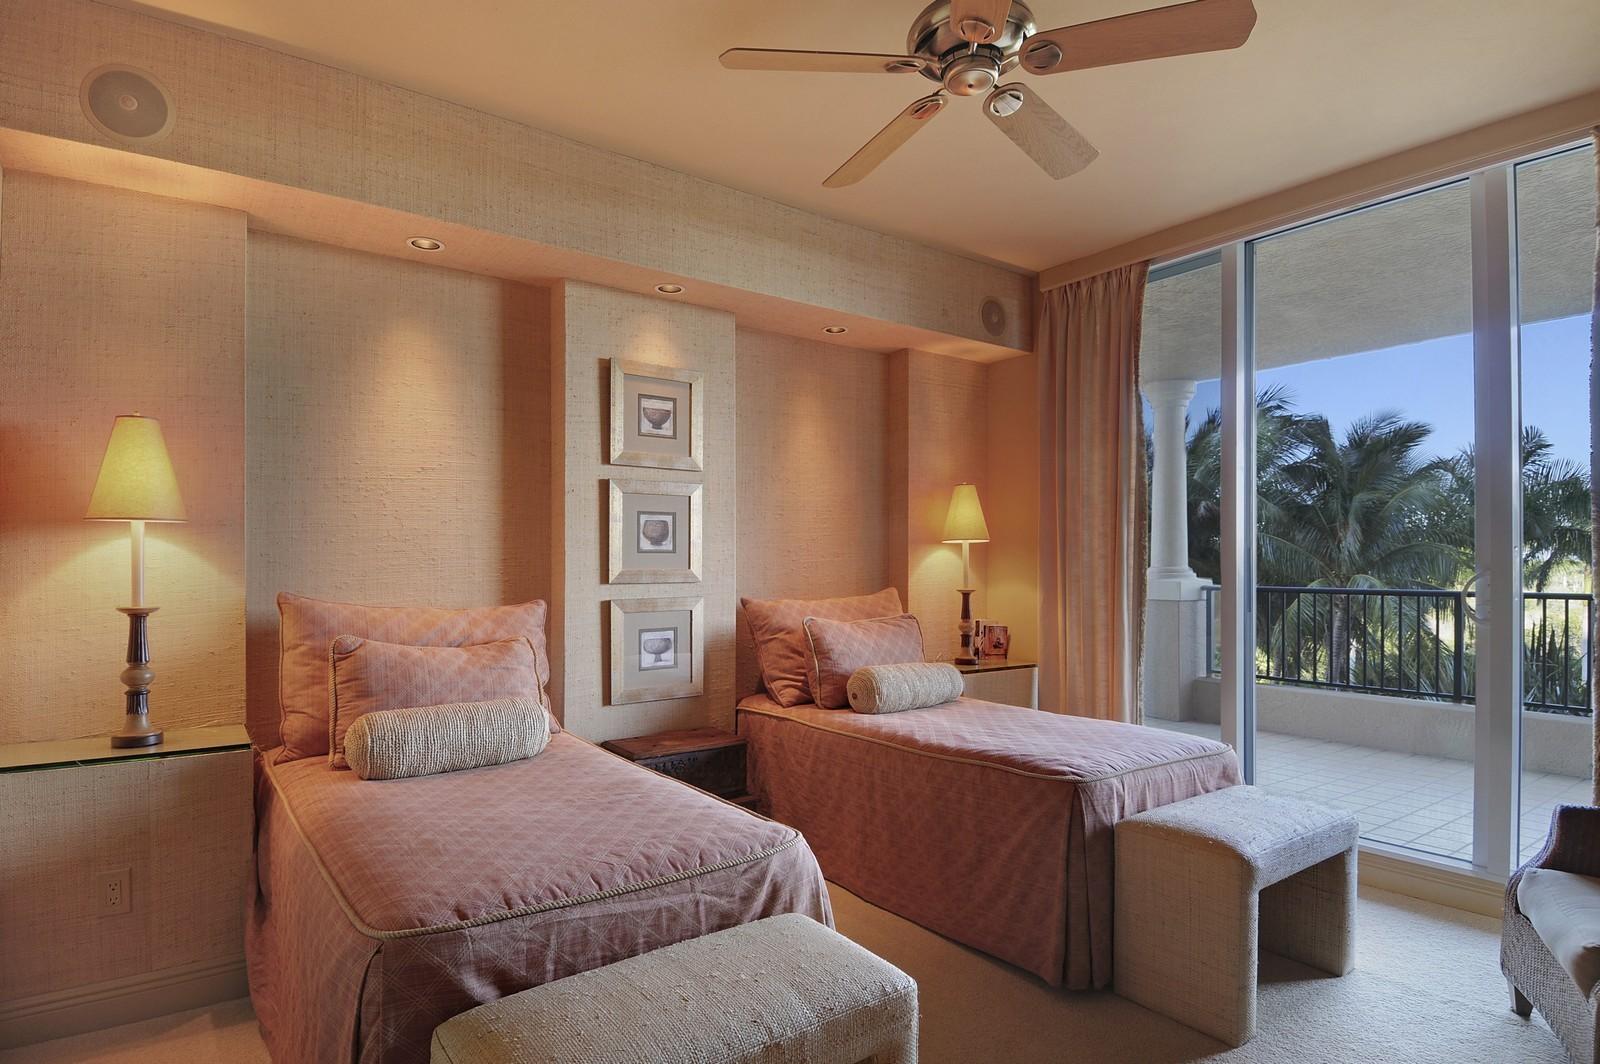 Real Estate Photography - 4875 Pelican Colony Blvd, Unit 304, Bonita Springs, FL, 34134 - 3rd Bedroom